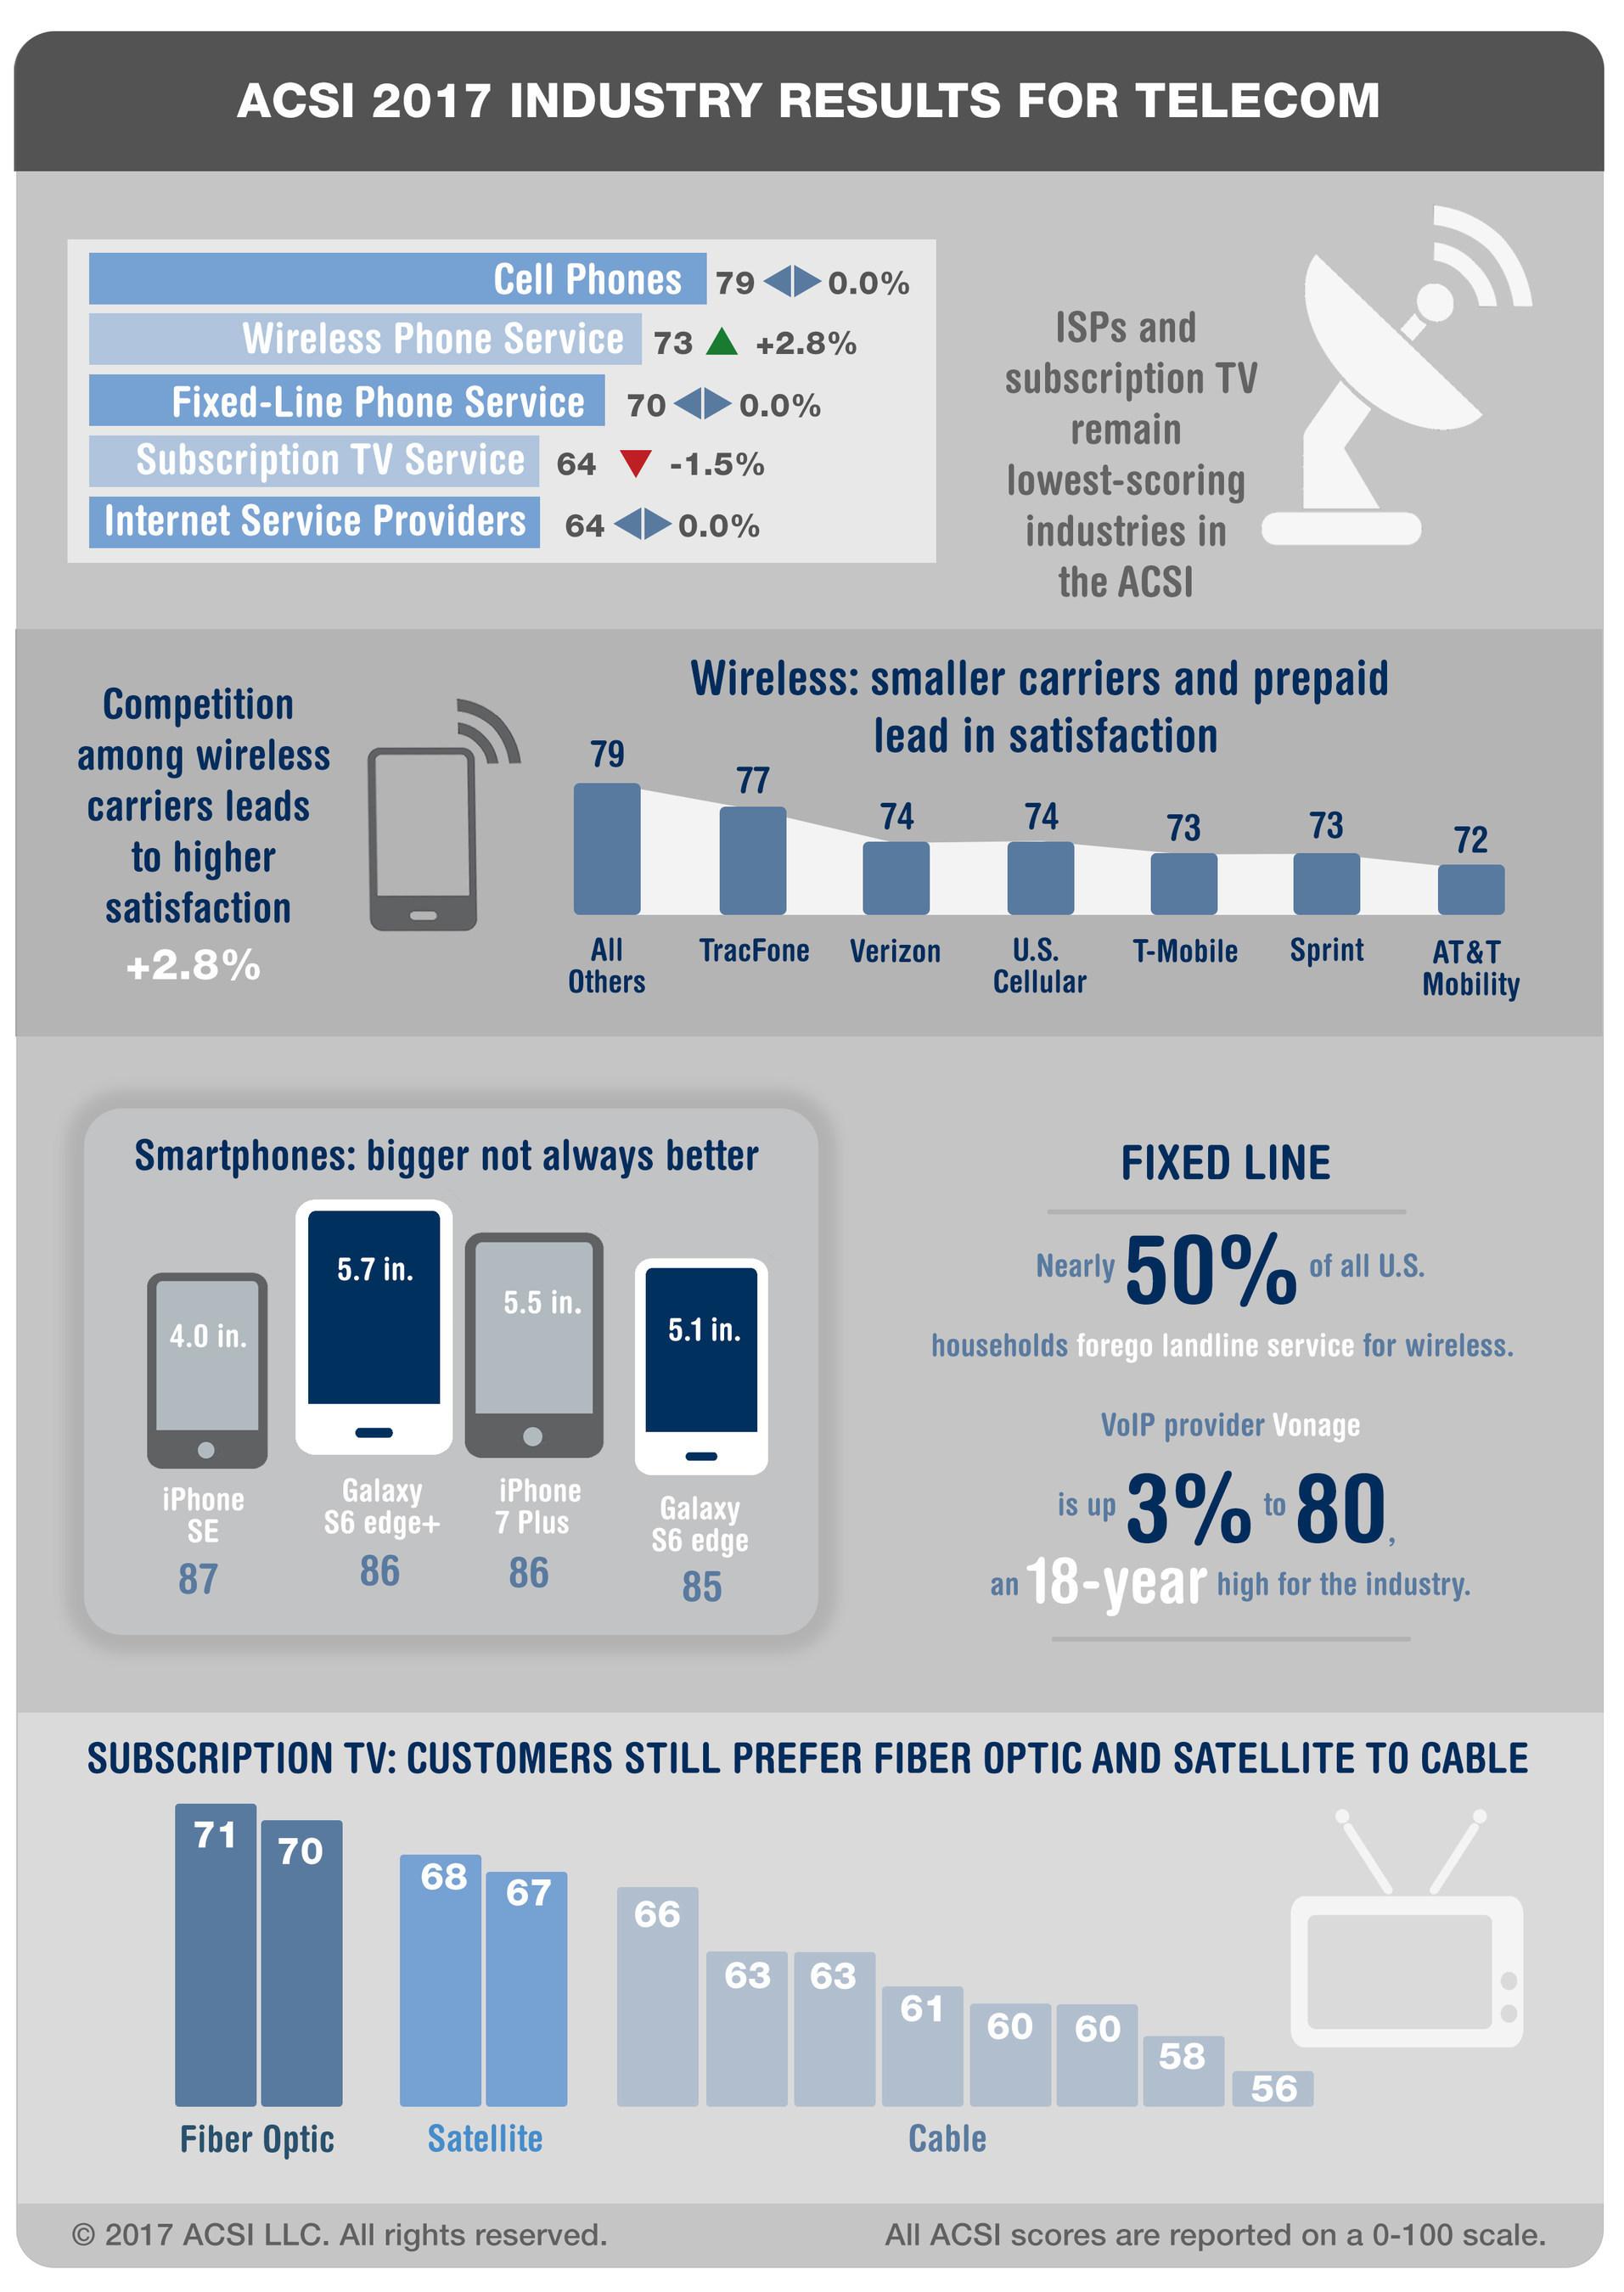 ACSI 2017 Customer Satisfaction Results for Telecom